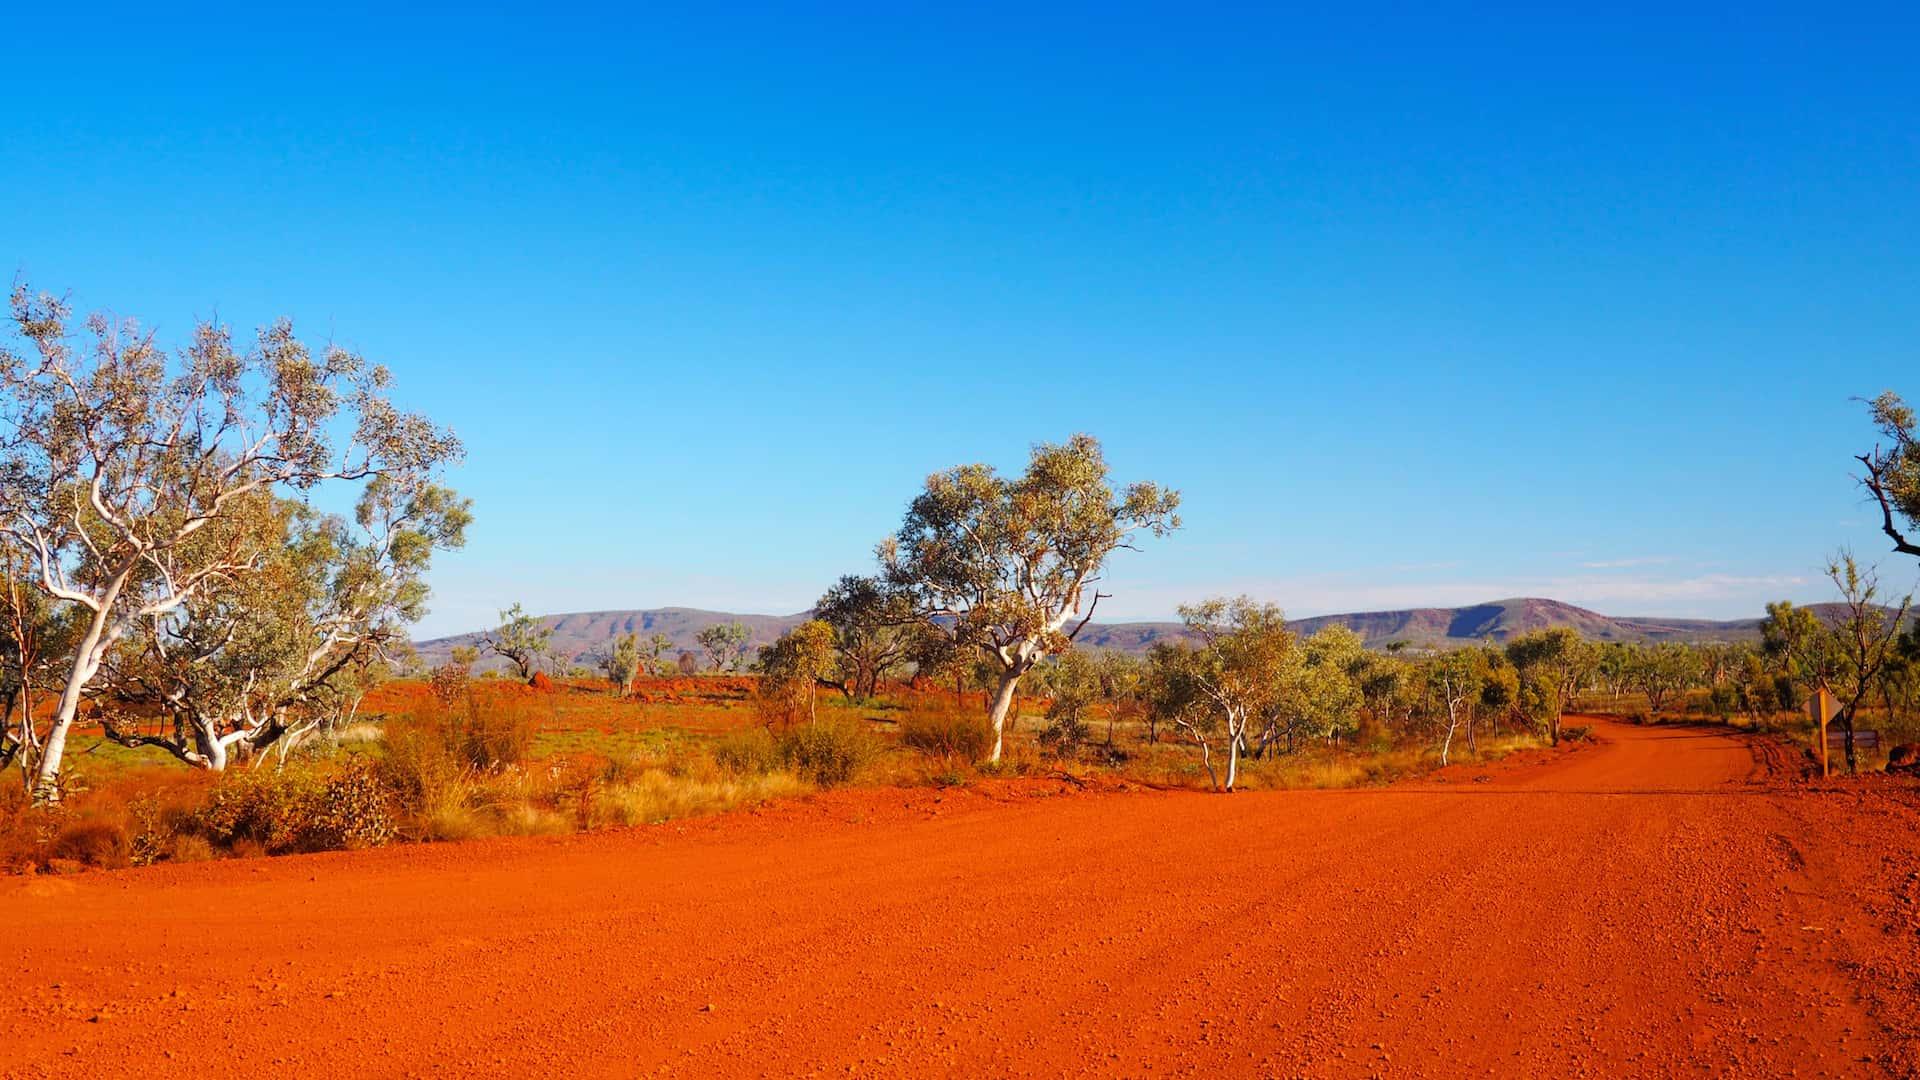 IMAGES OF WESTERN AUSTRALIA